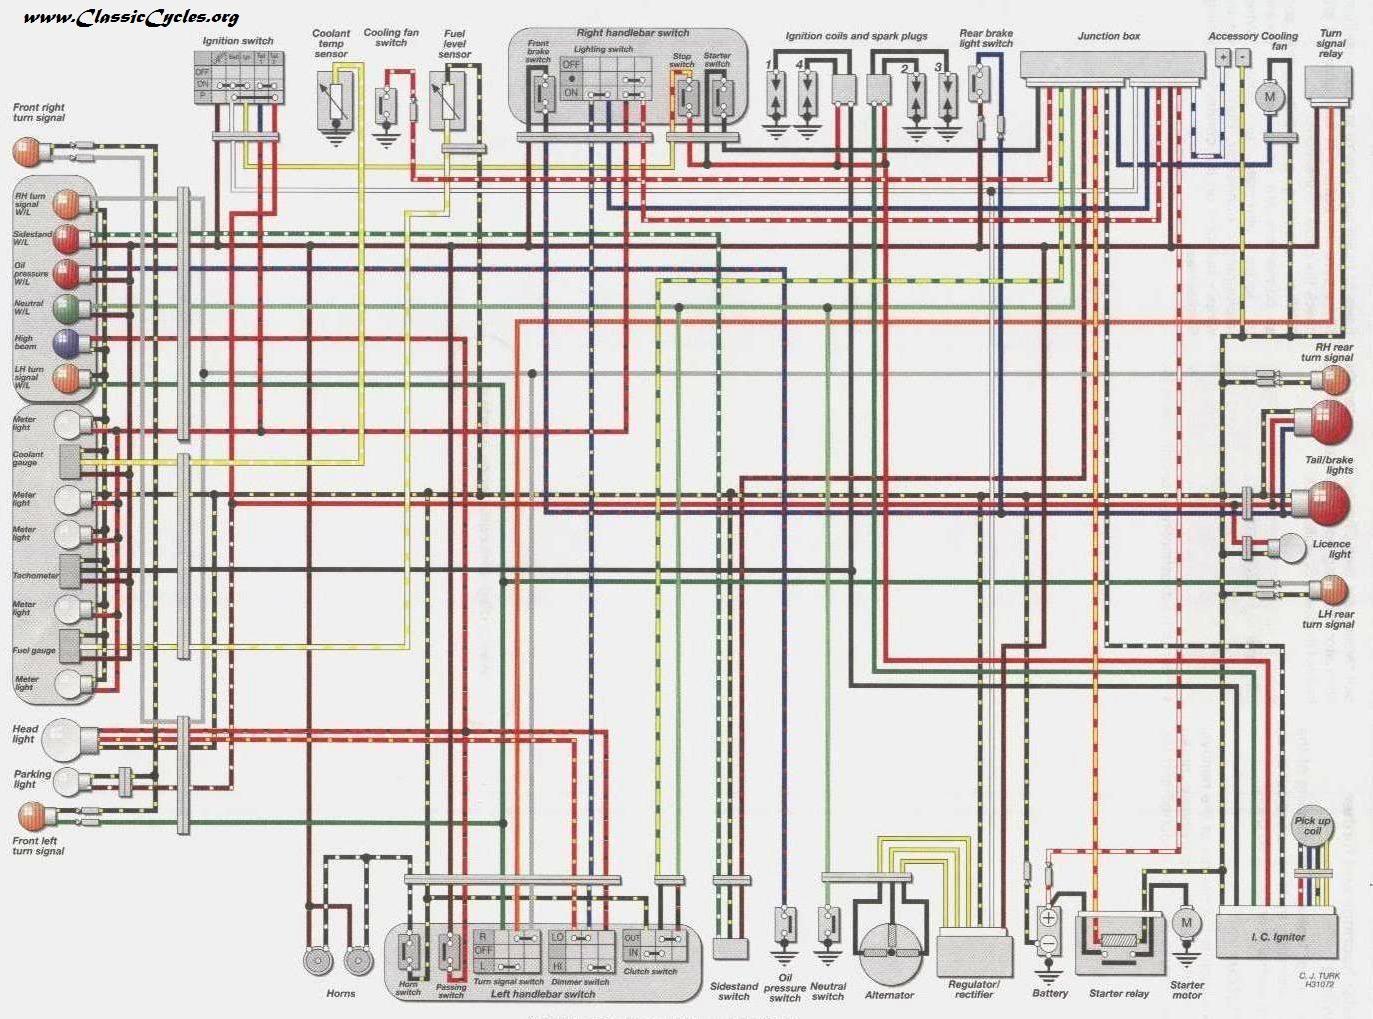 Super Zx6R Wire Diagram Wiring Library Wiring Cloud Licukshollocom